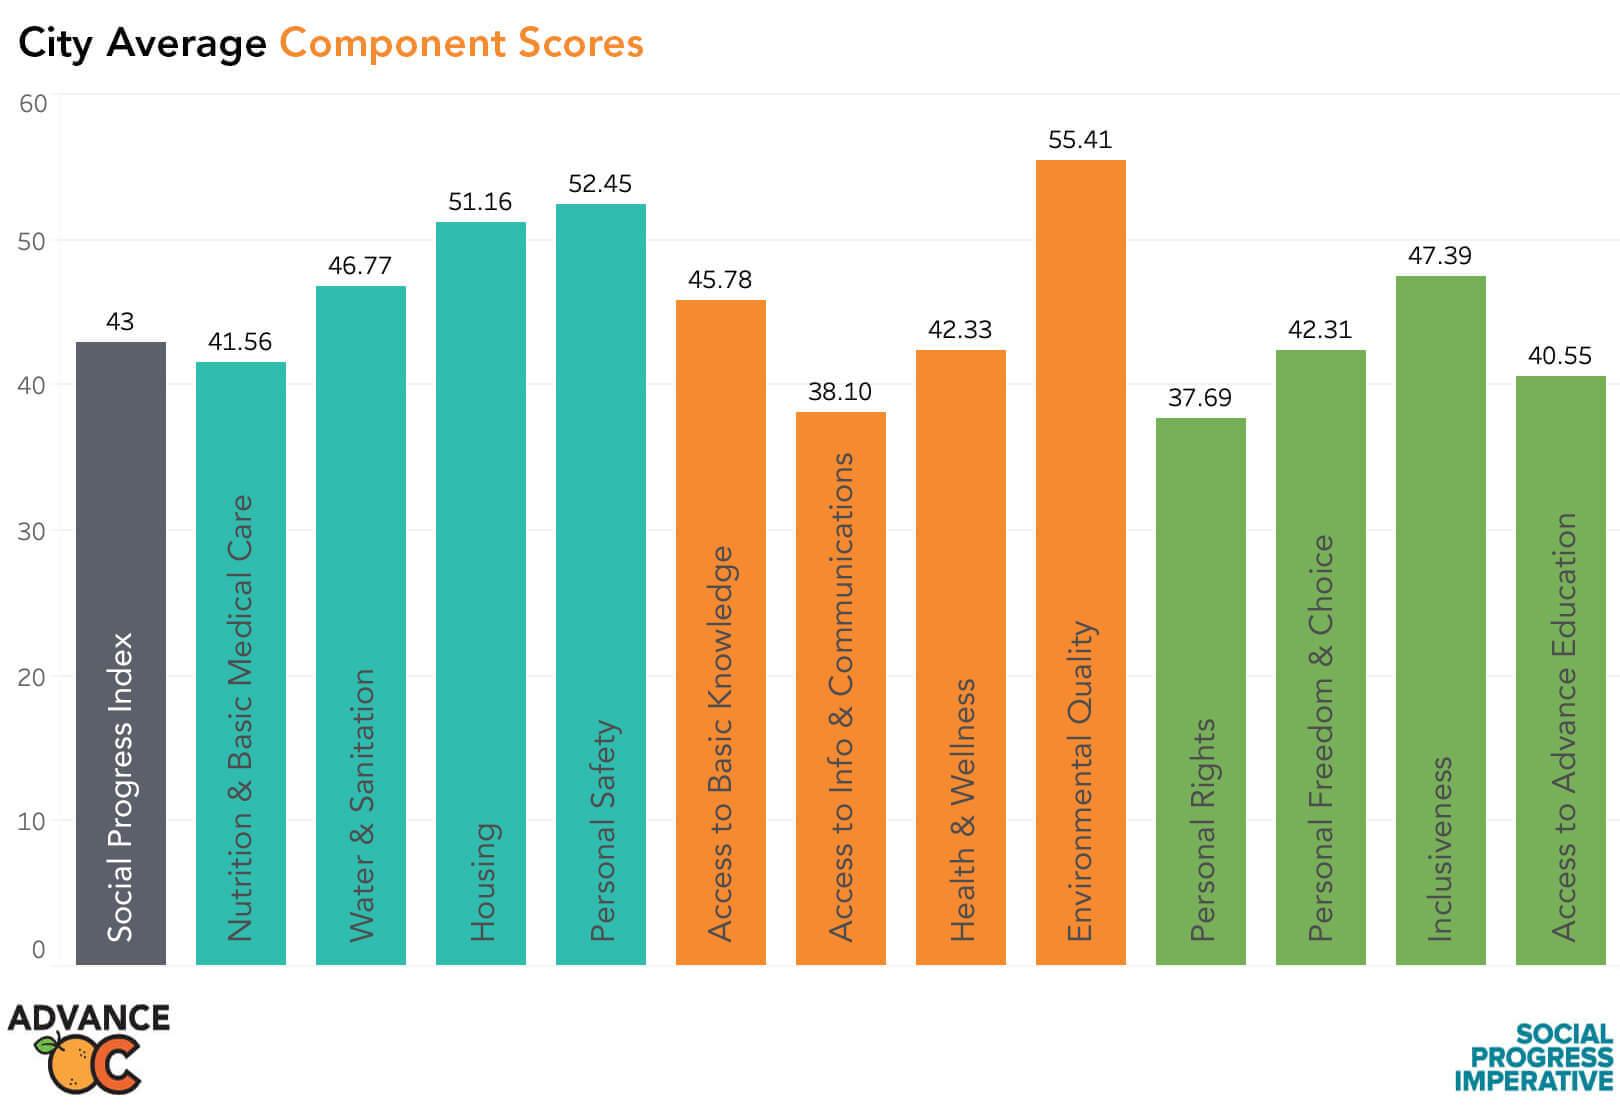 City Average Component Scores